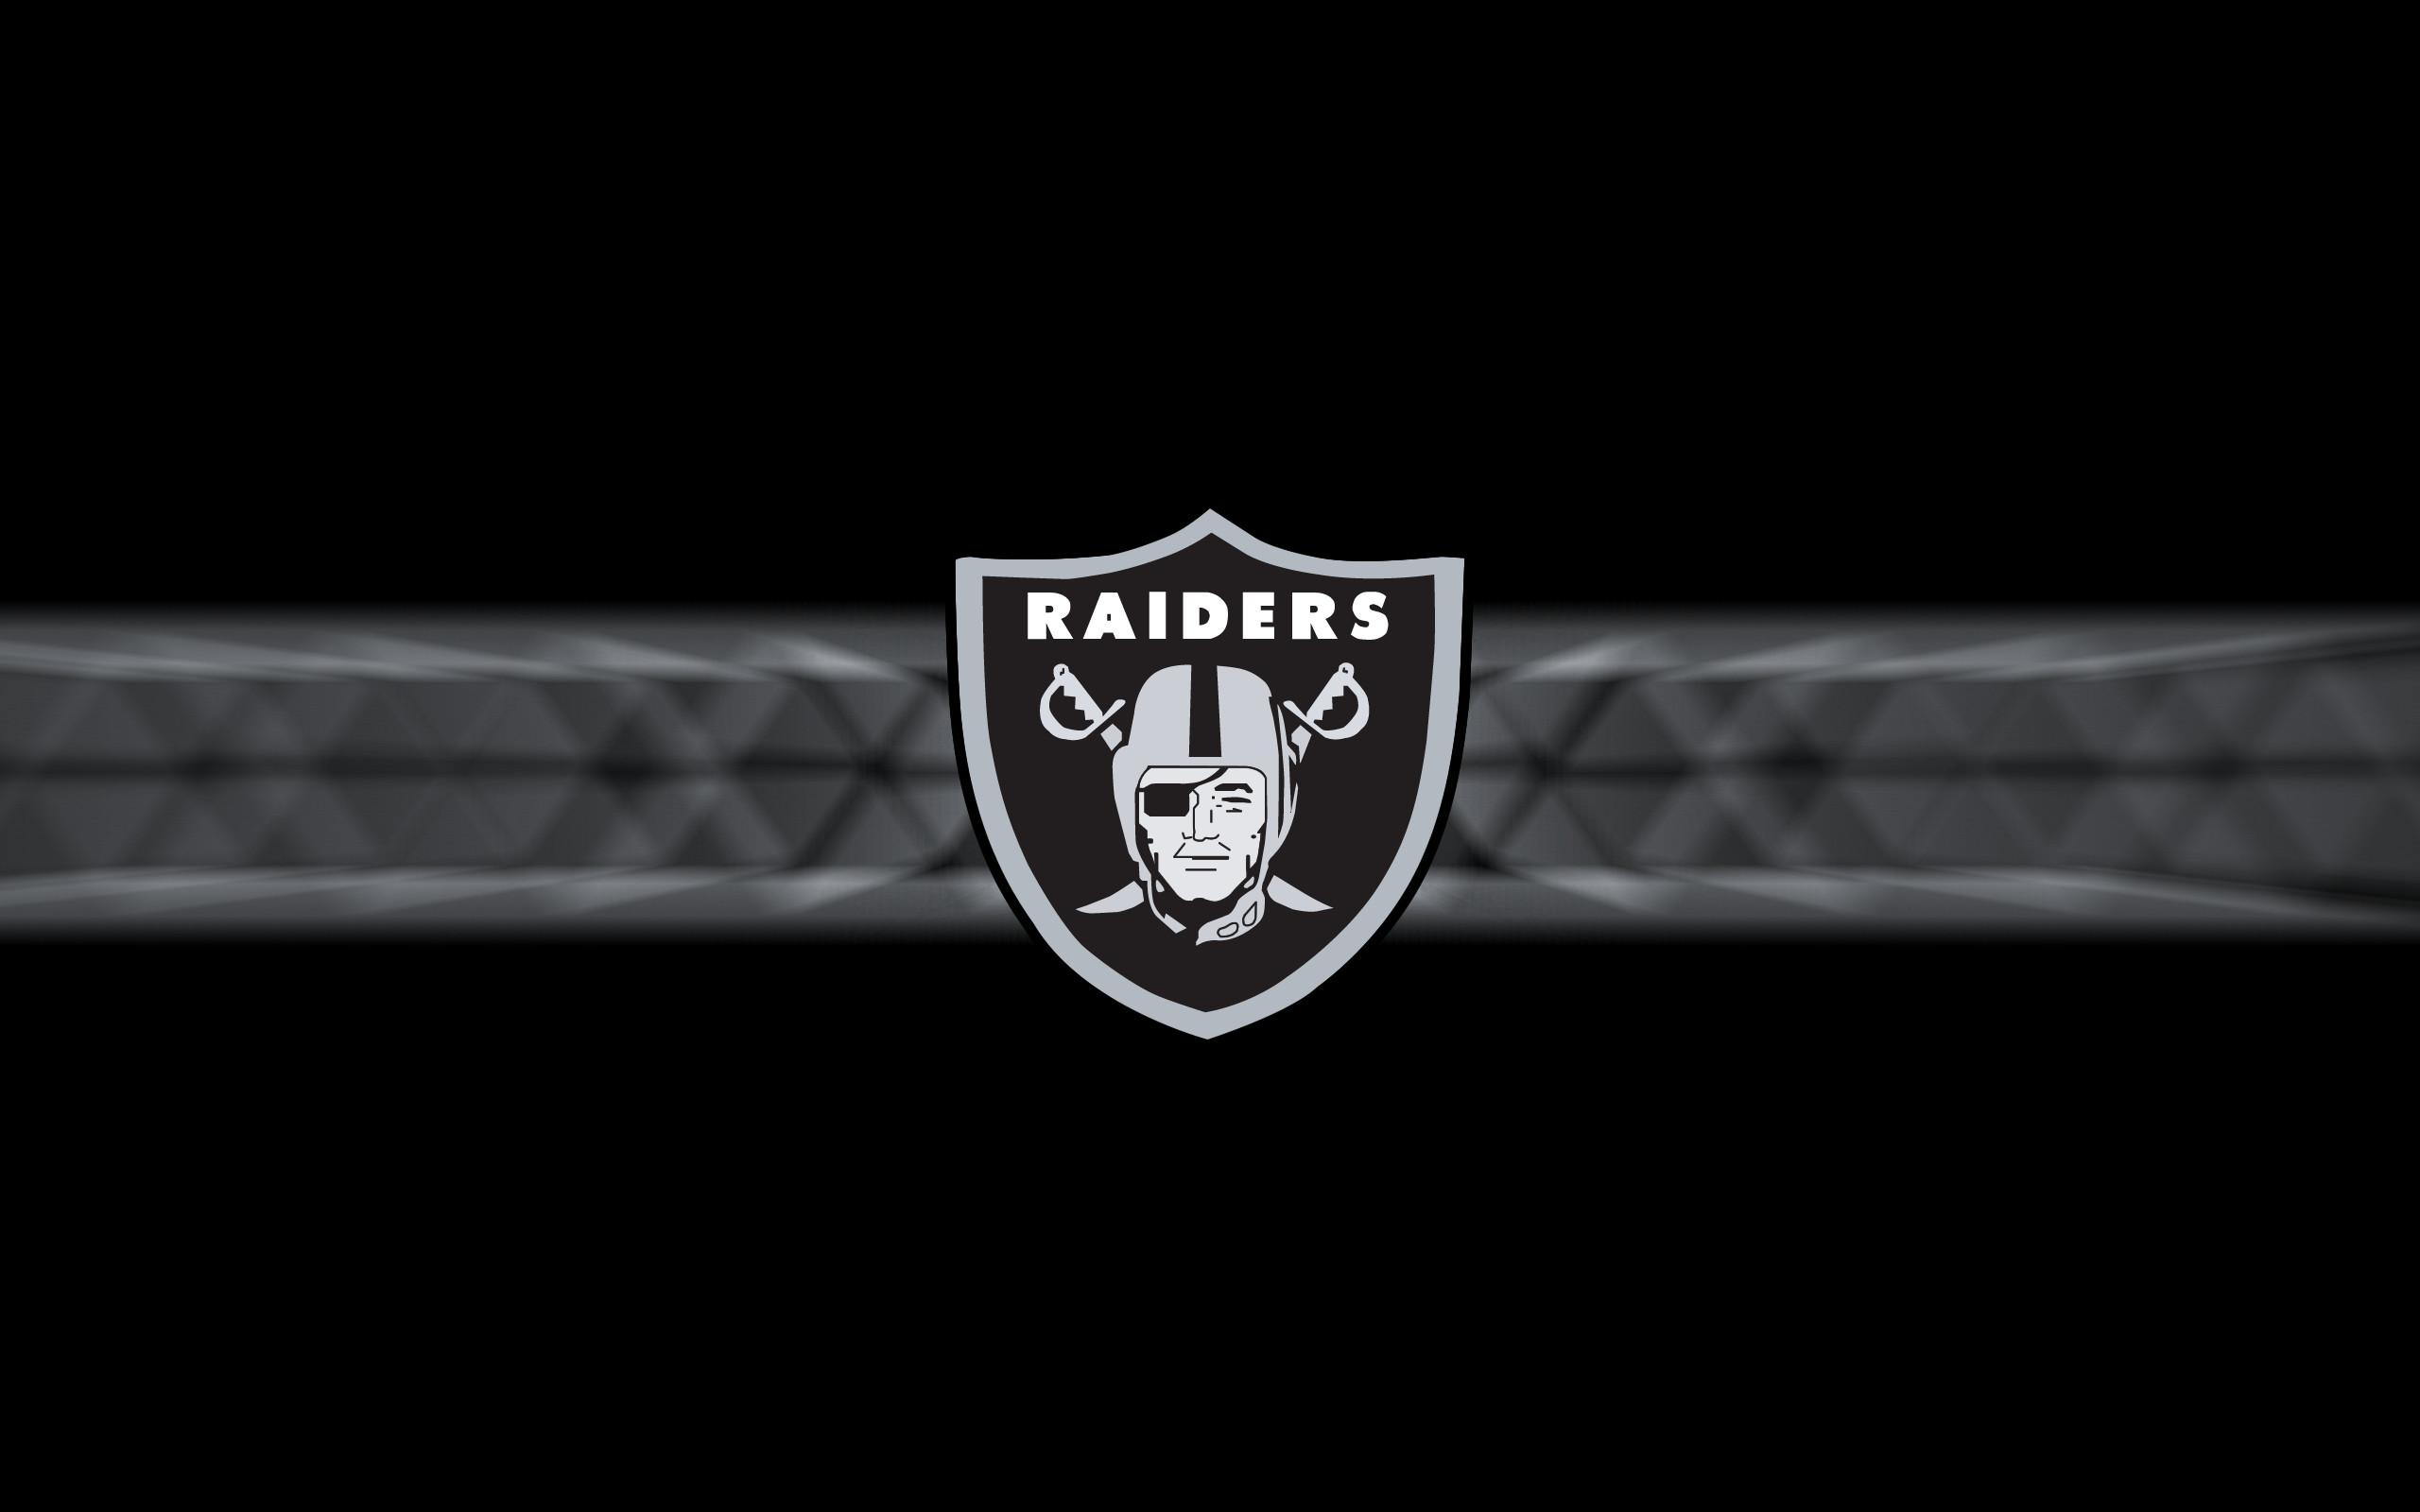 NFL Logo Team Oakland Raiders wallpaper HD. Free desktop .